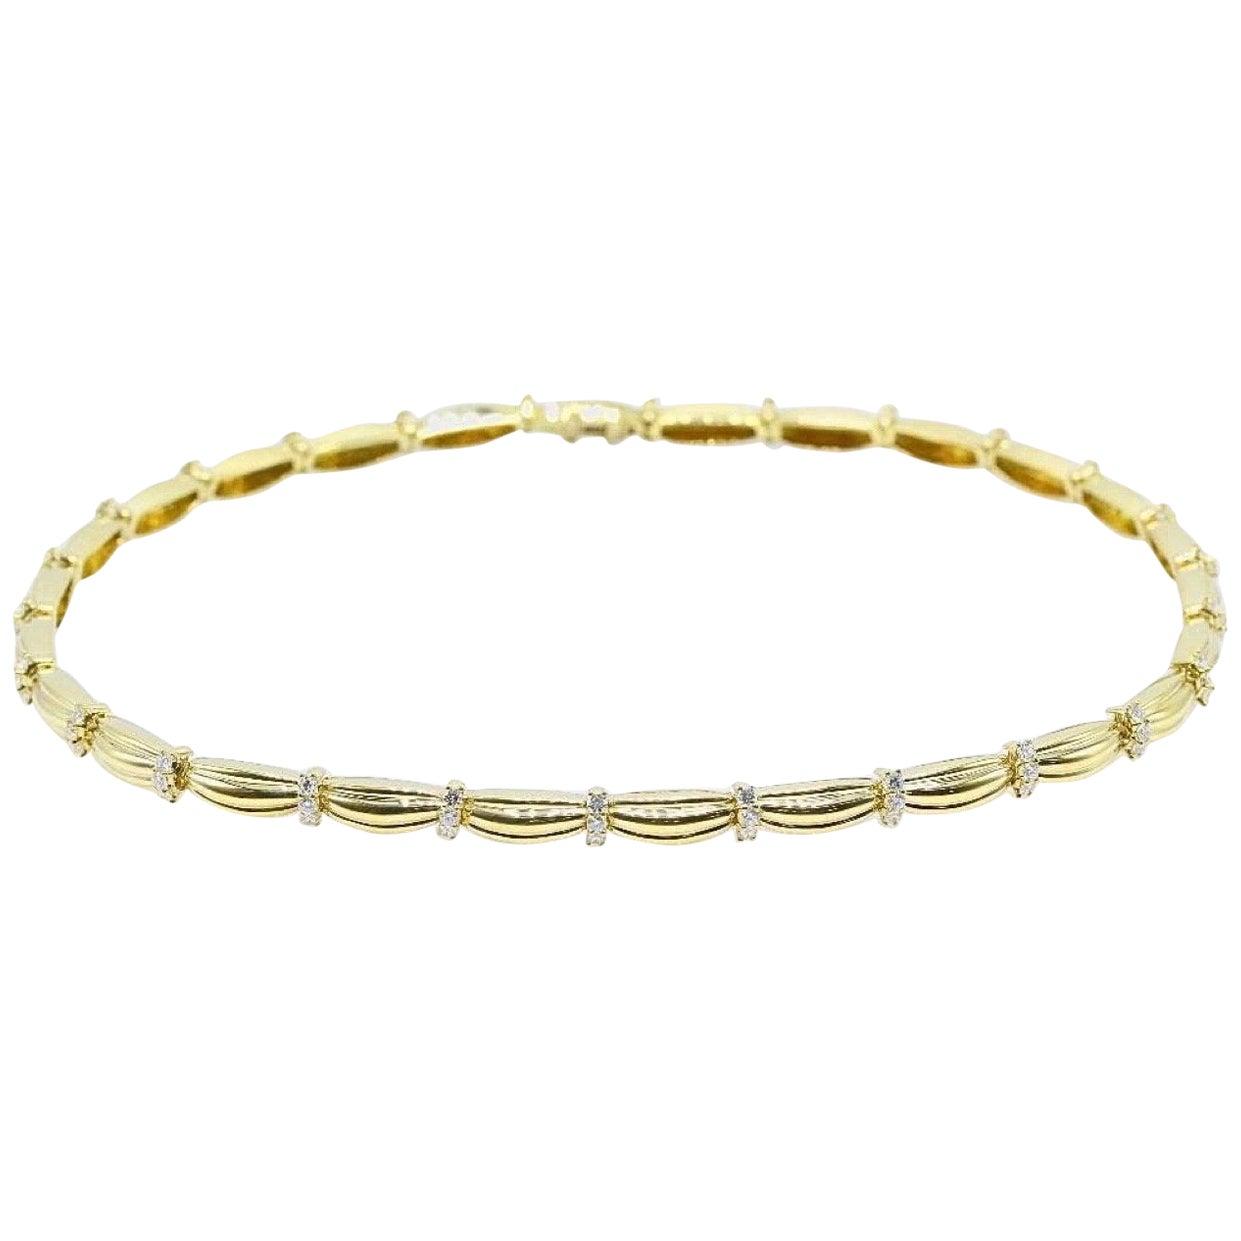 Tiffany & Co. 1992 Diamonds and 18 Karat Yellow Gold Station Necklace 4.00 Carat